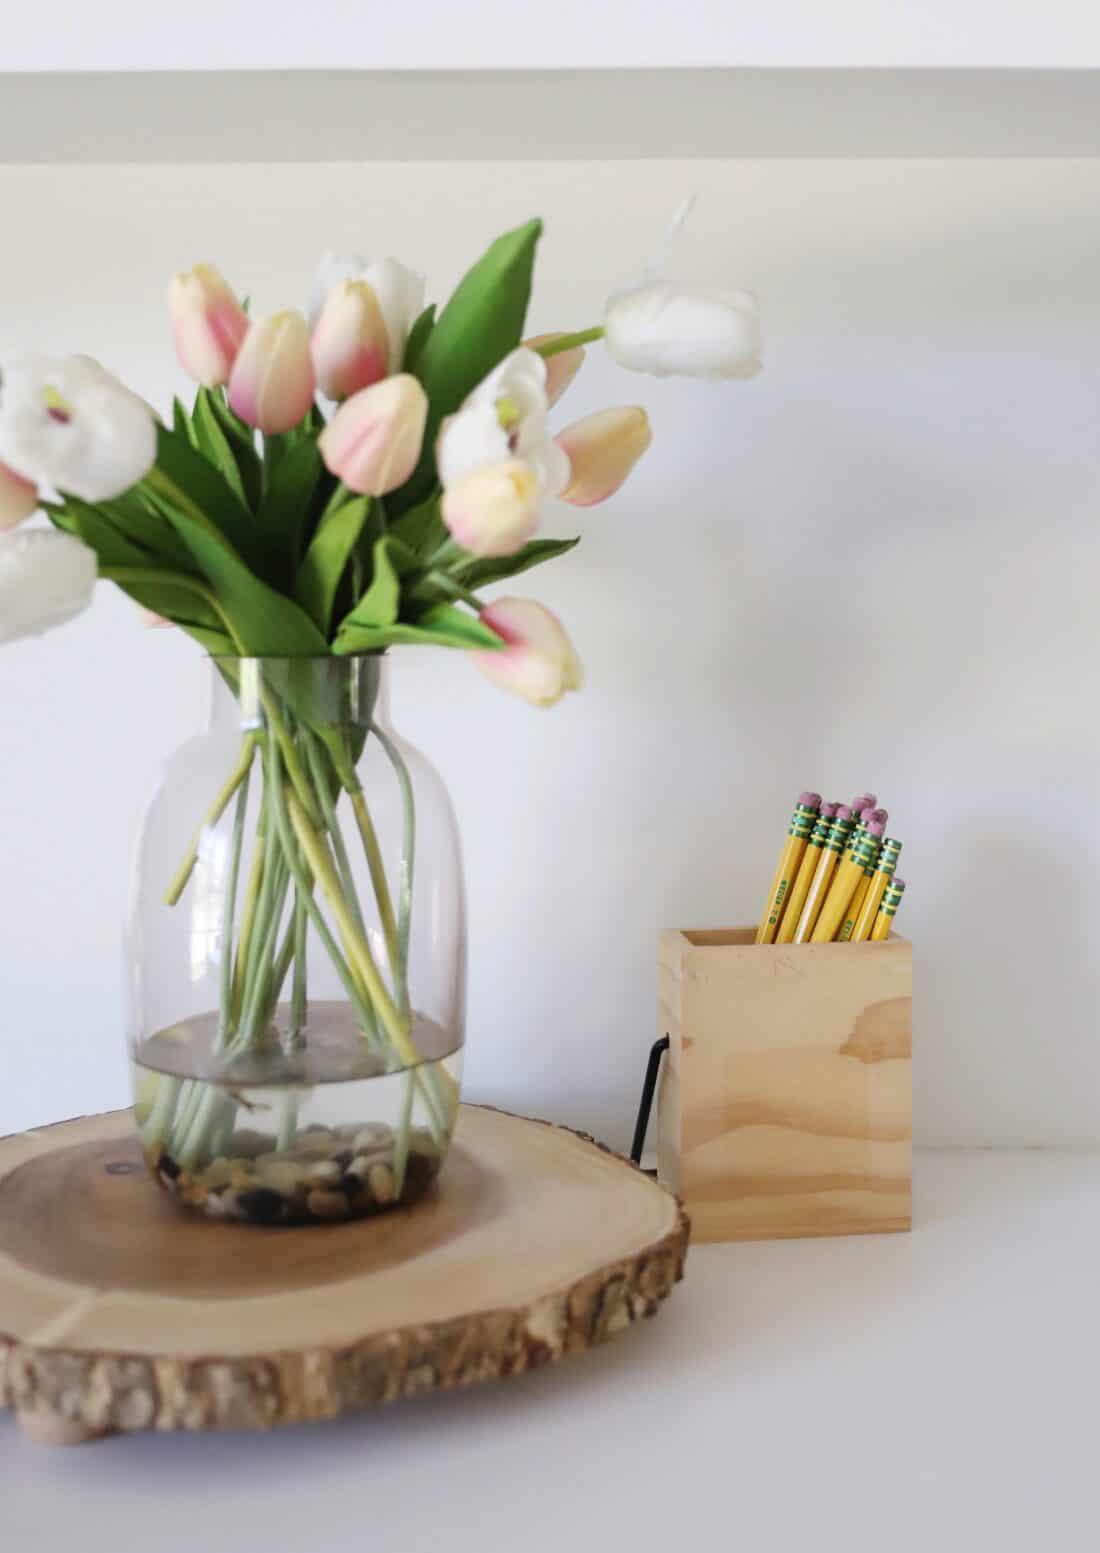 tulips and homeschool pencils in a wooden jar